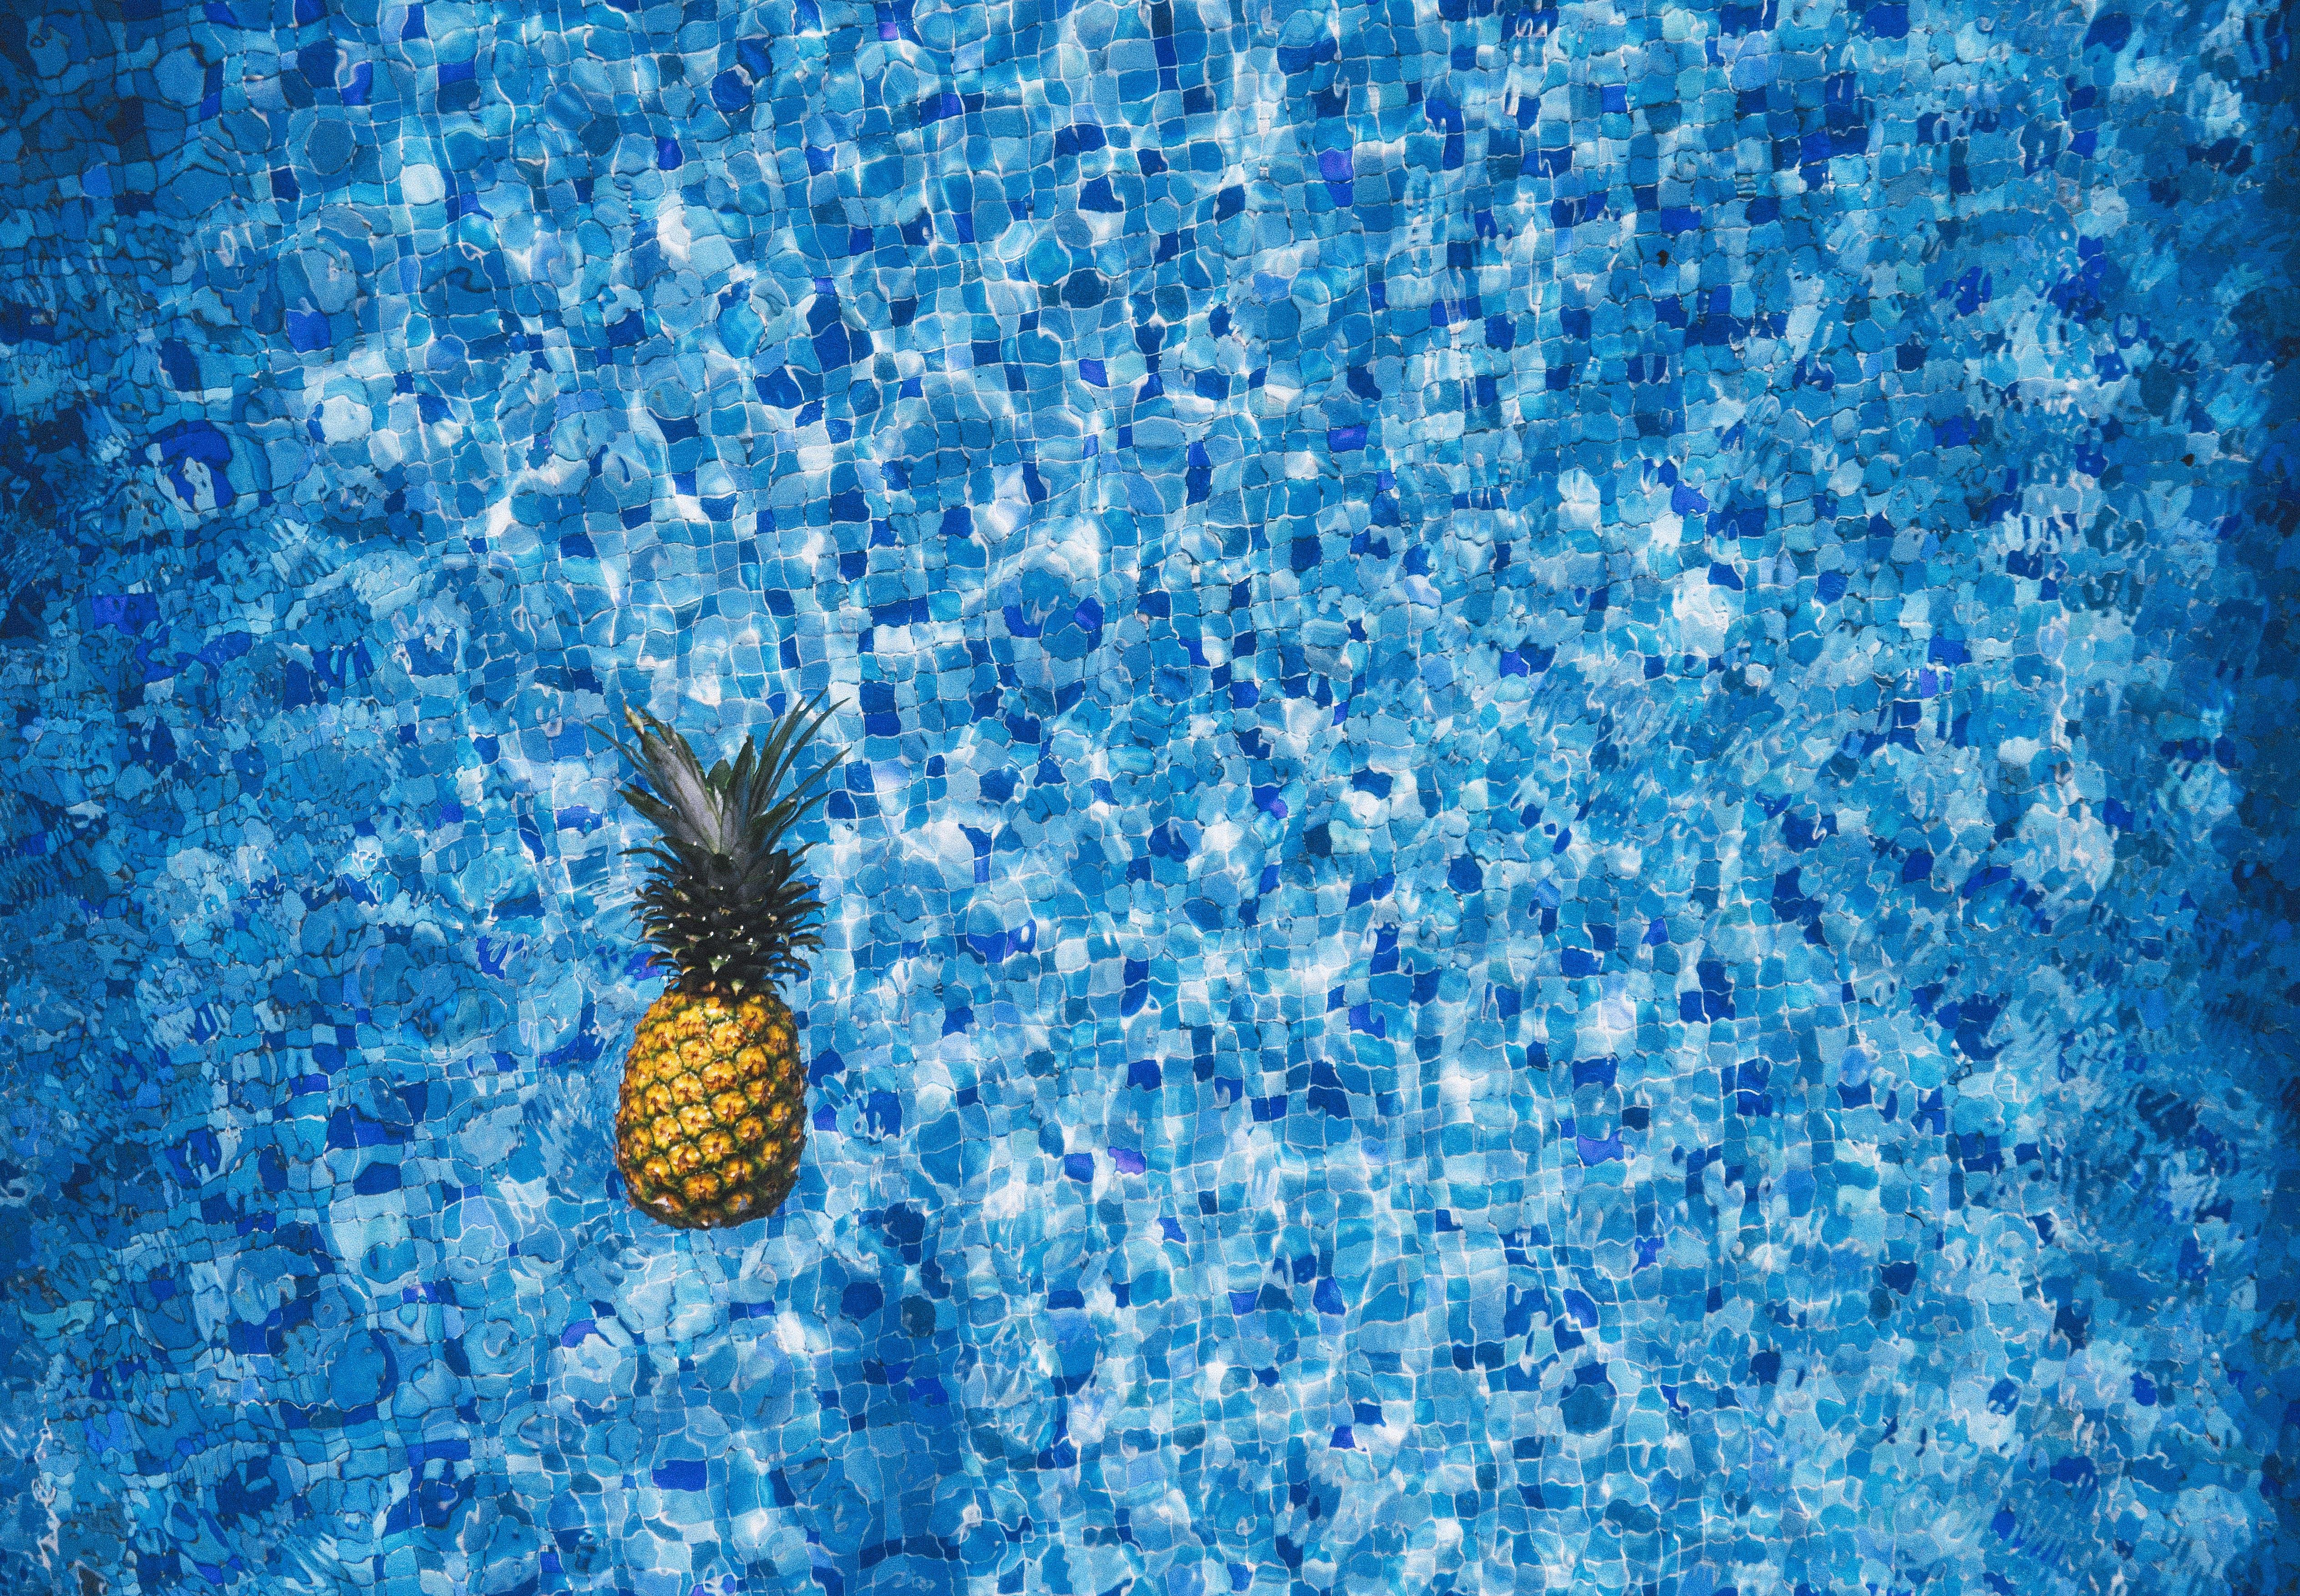 Foto stok gratis air, biru, buah, buah tropis